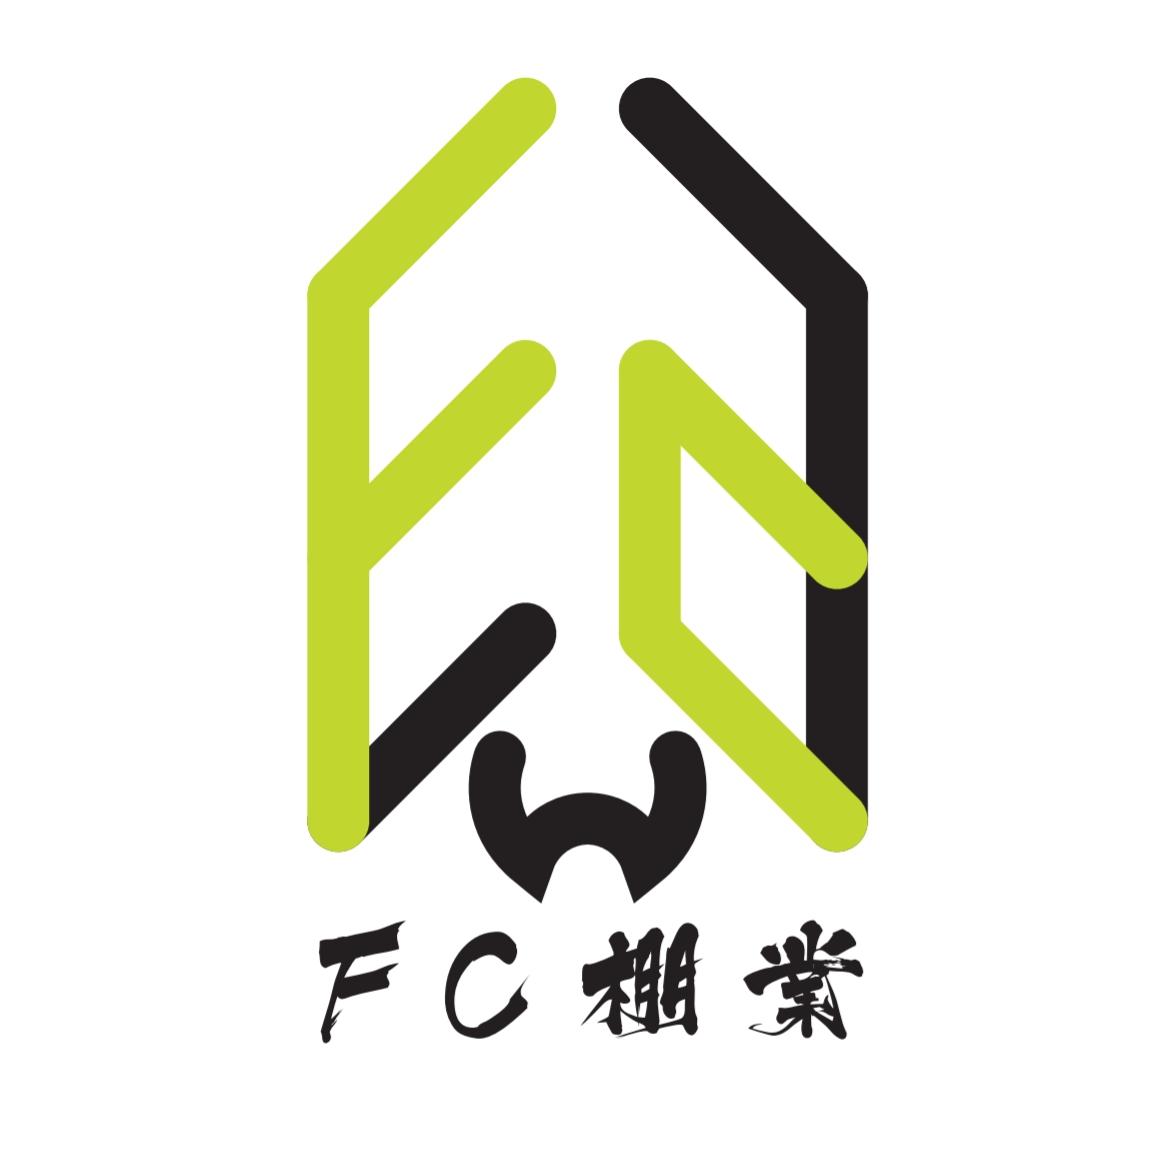 FC Scaffolding Ltd | FC棚業